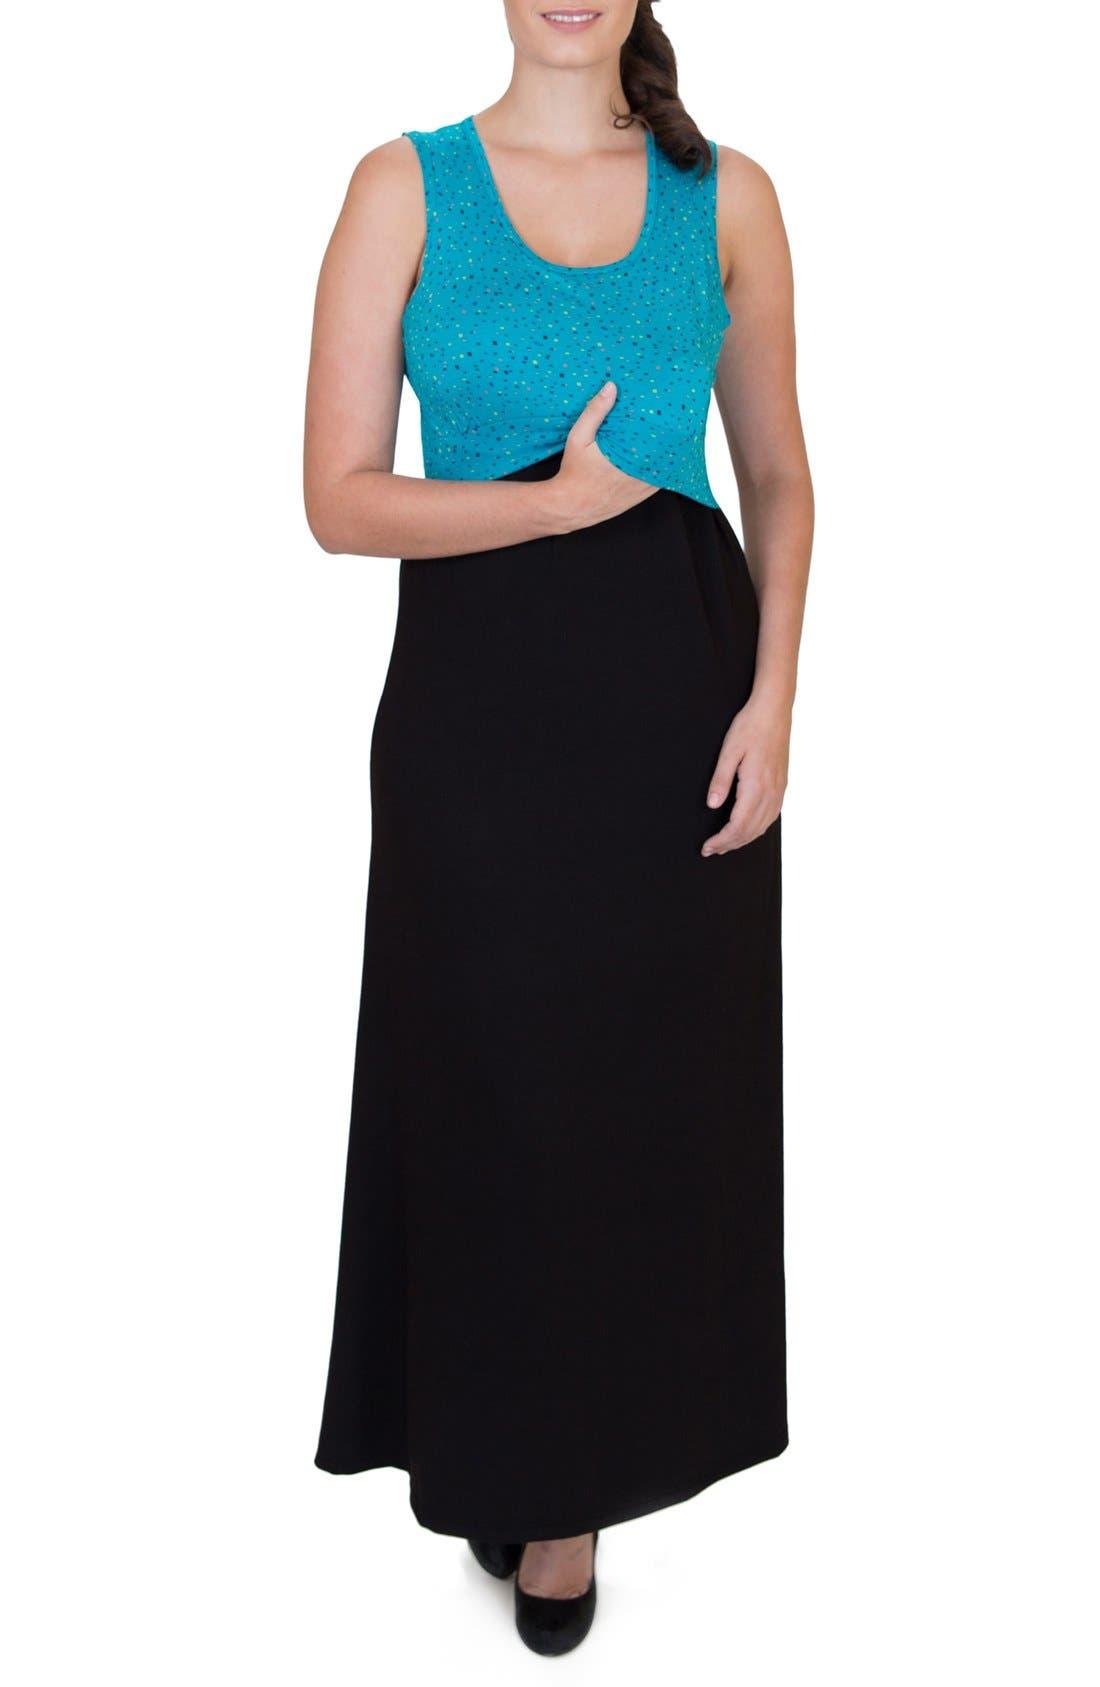 'Mariana' Maternity/Nursing Maxi Dress,                             Alternate thumbnail 4, color,                             DOTS TOP W/ BLACK SKIRT